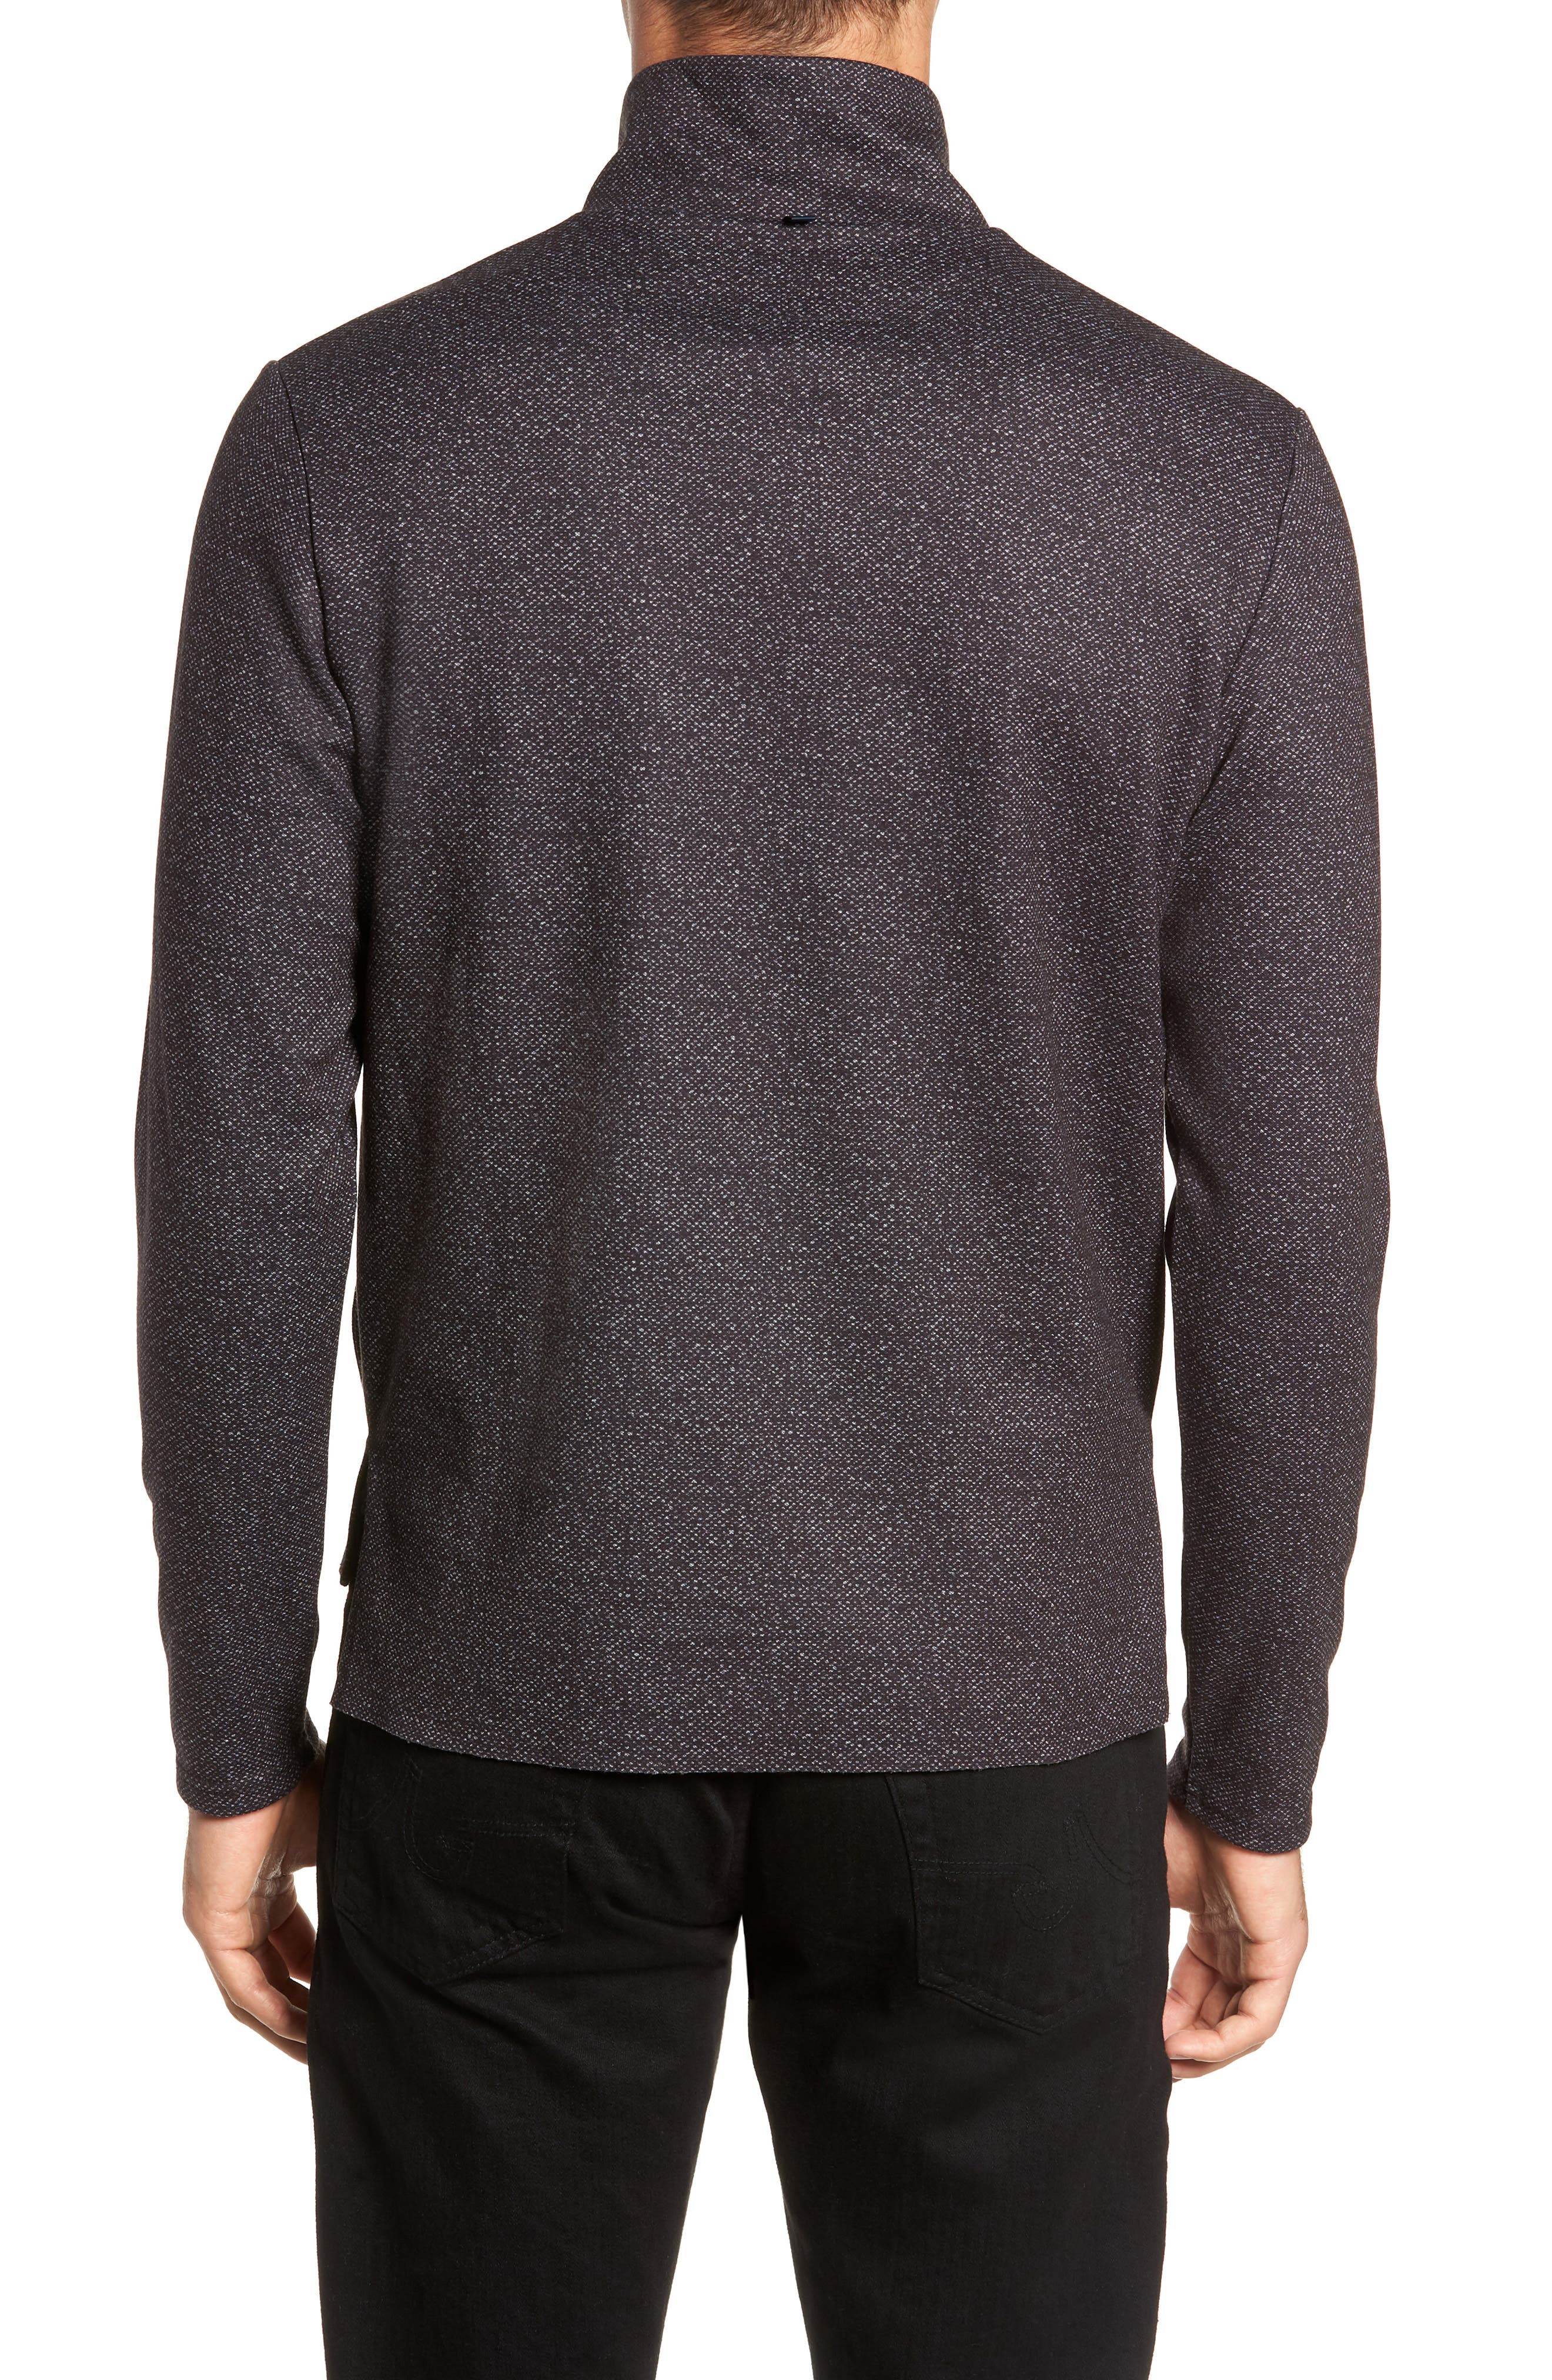 Oscar Quarter Zip Slim Fit Sweater,                             Alternate thumbnail 2, color,                             CHARCOAL